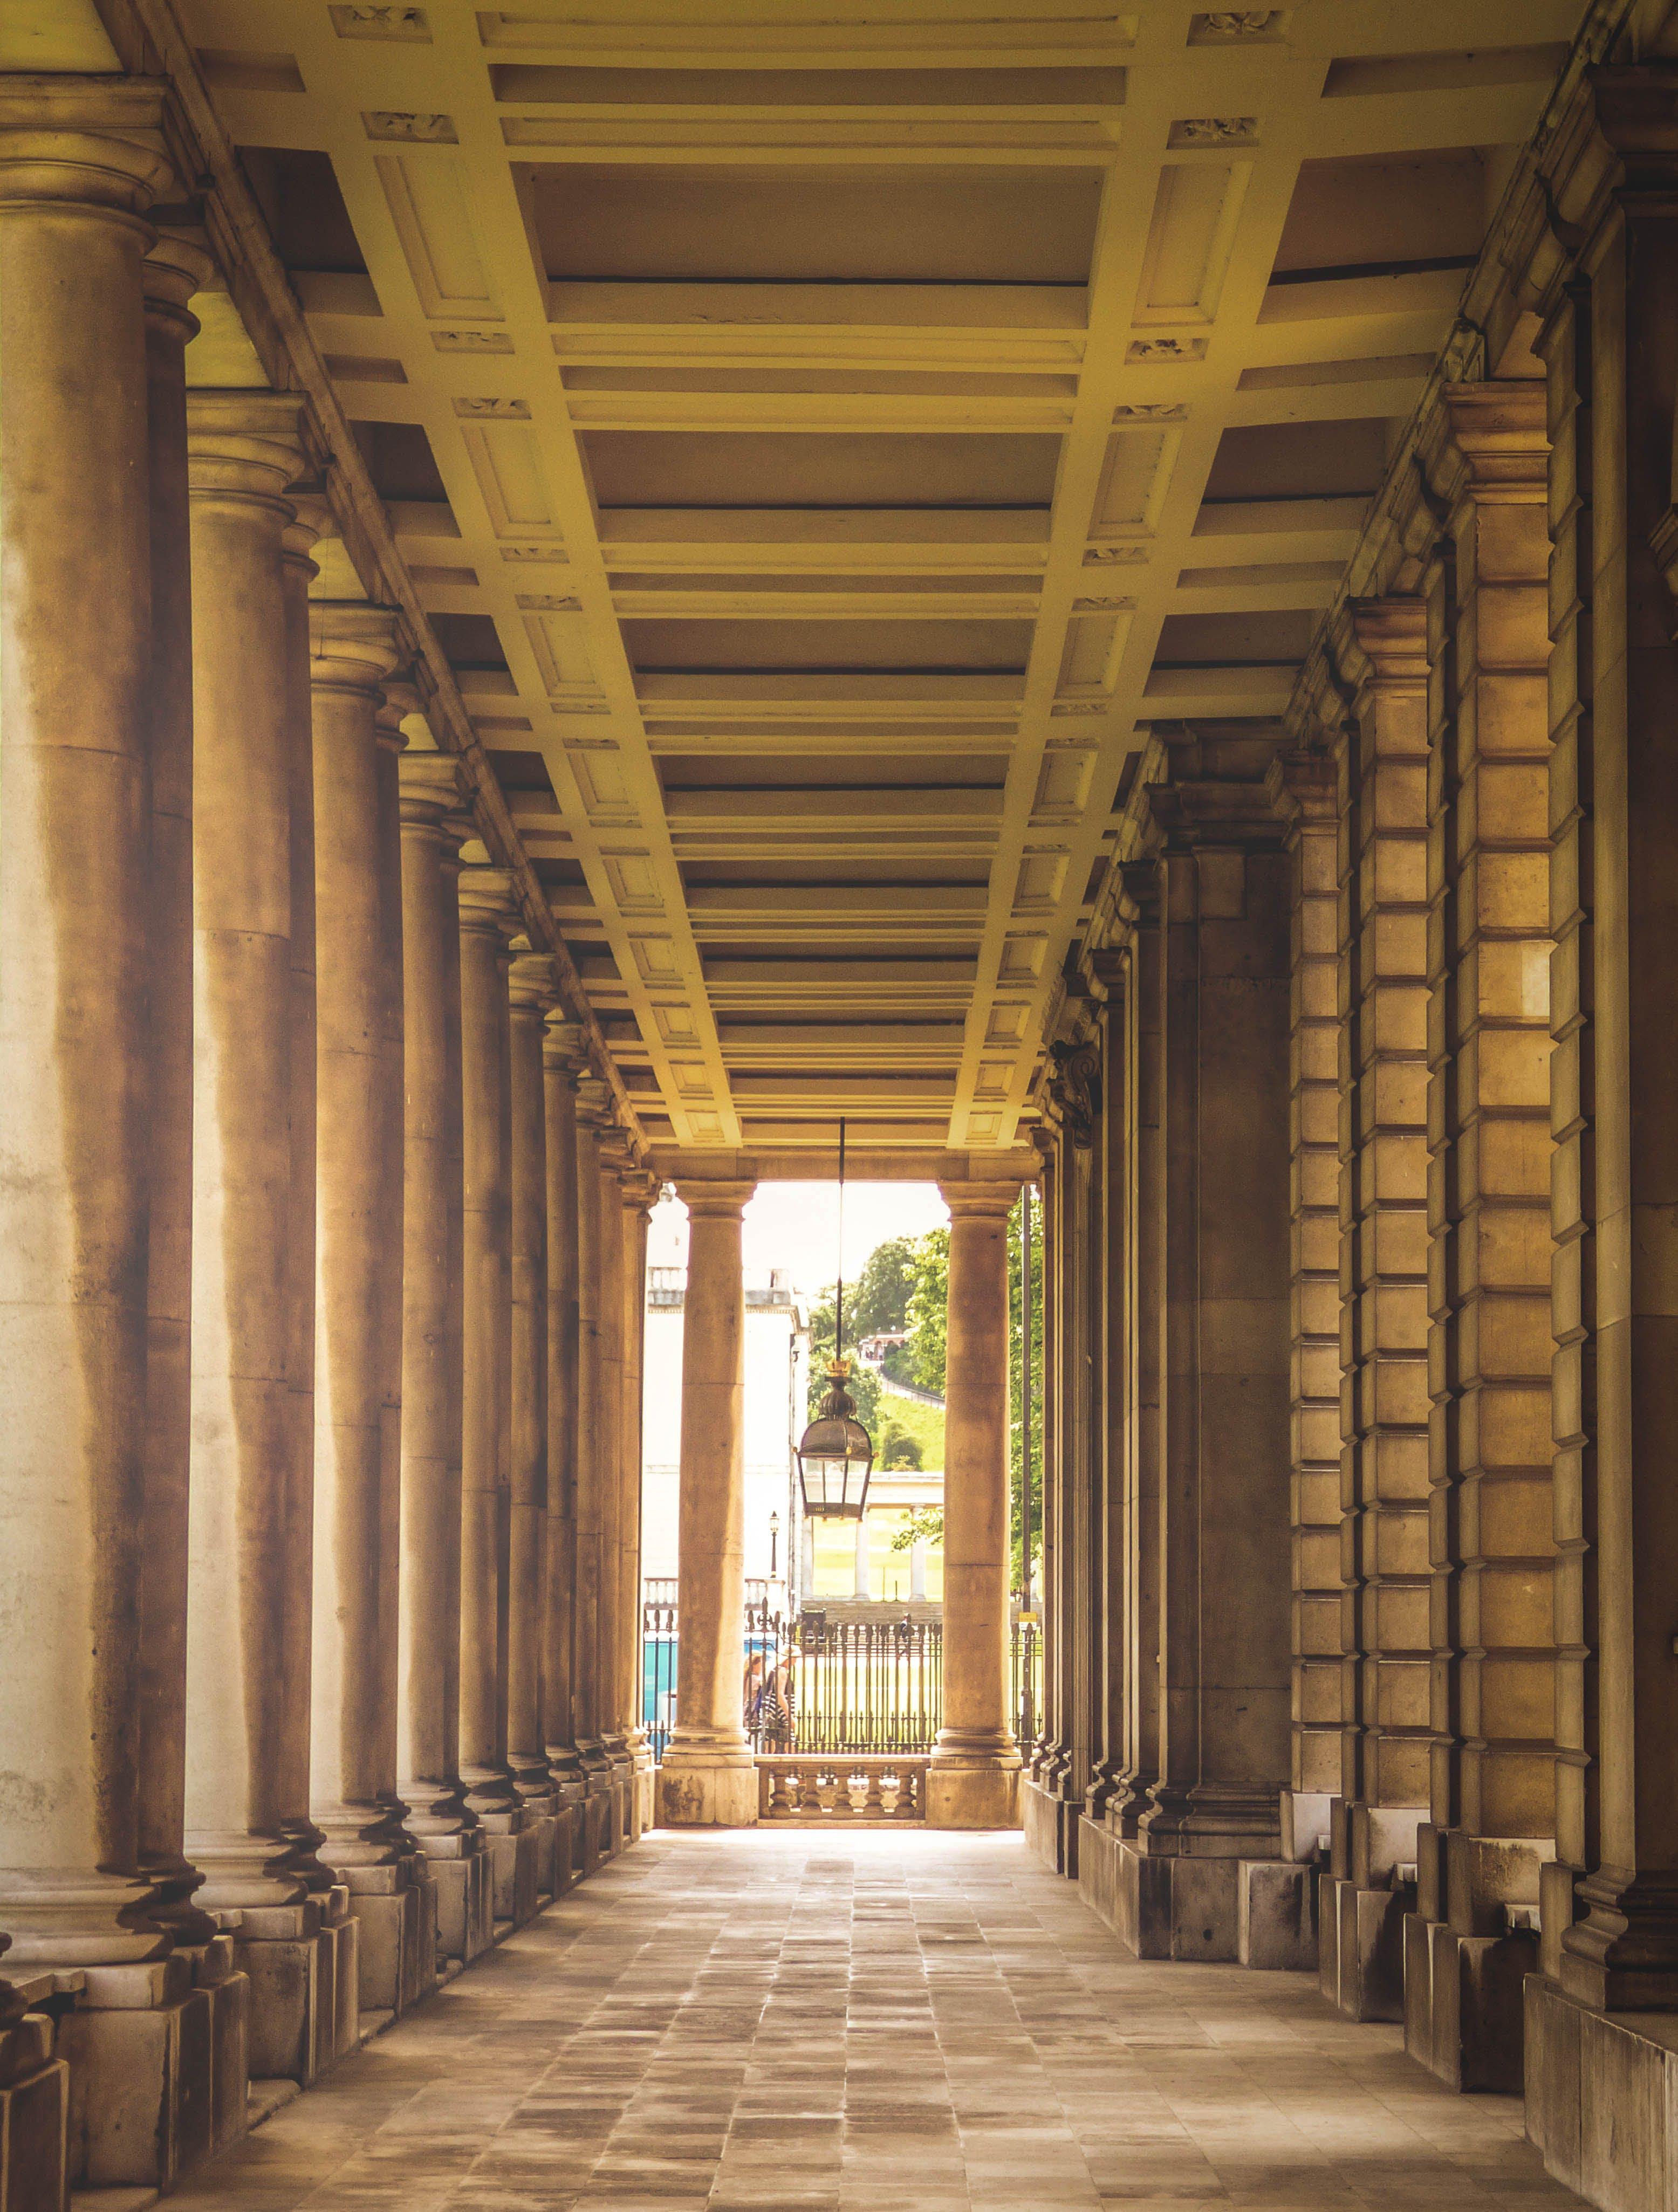 Beige Pathway With Pillars